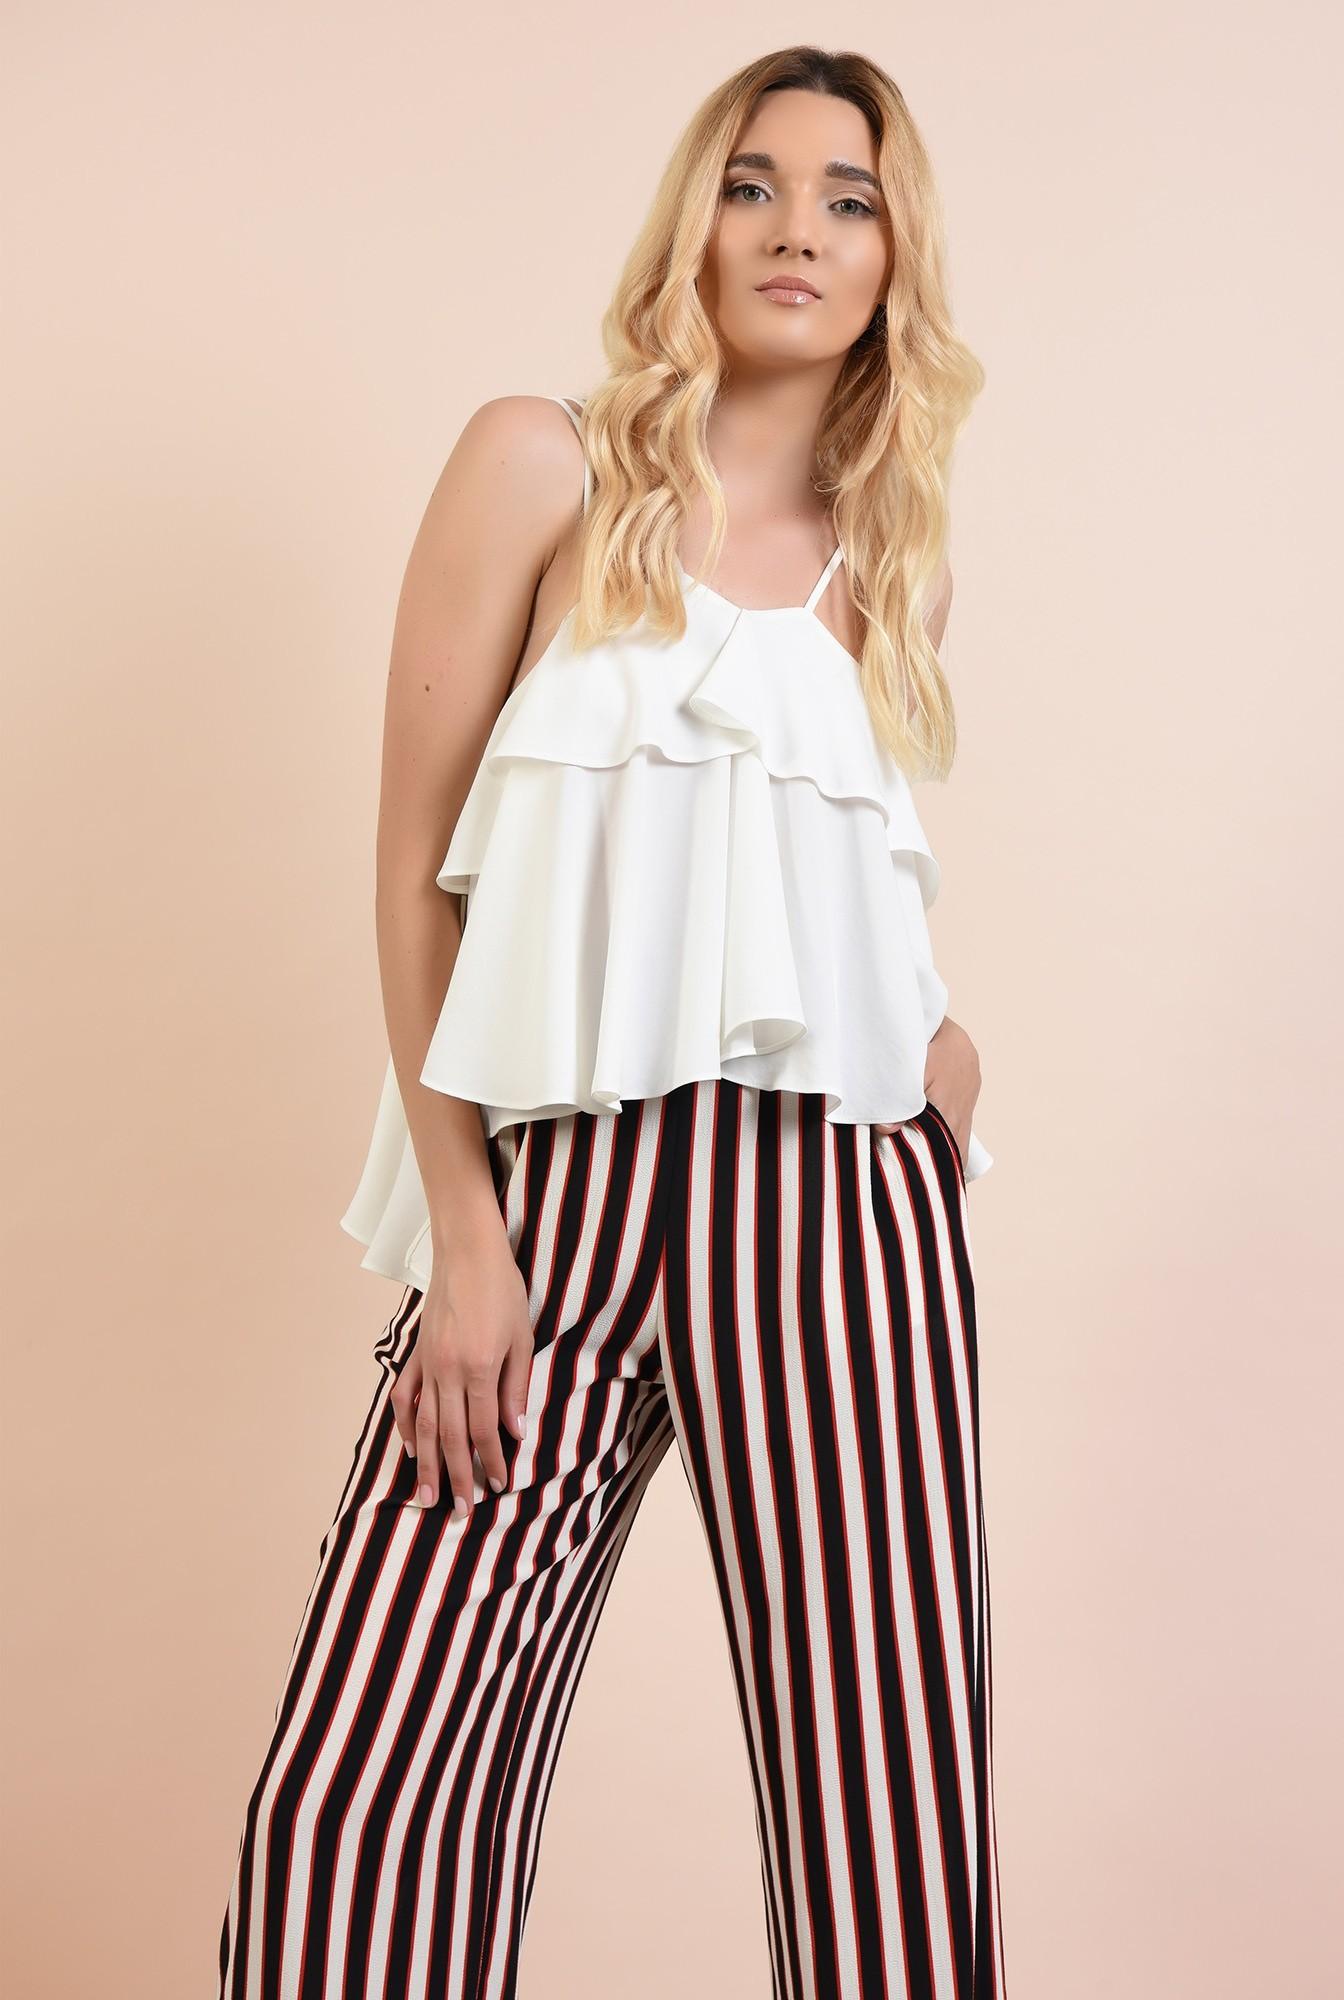 0 - 360 - pantaloni cu dungi, drepti, croi lejer, cu talie elastica, buzunare, Poema